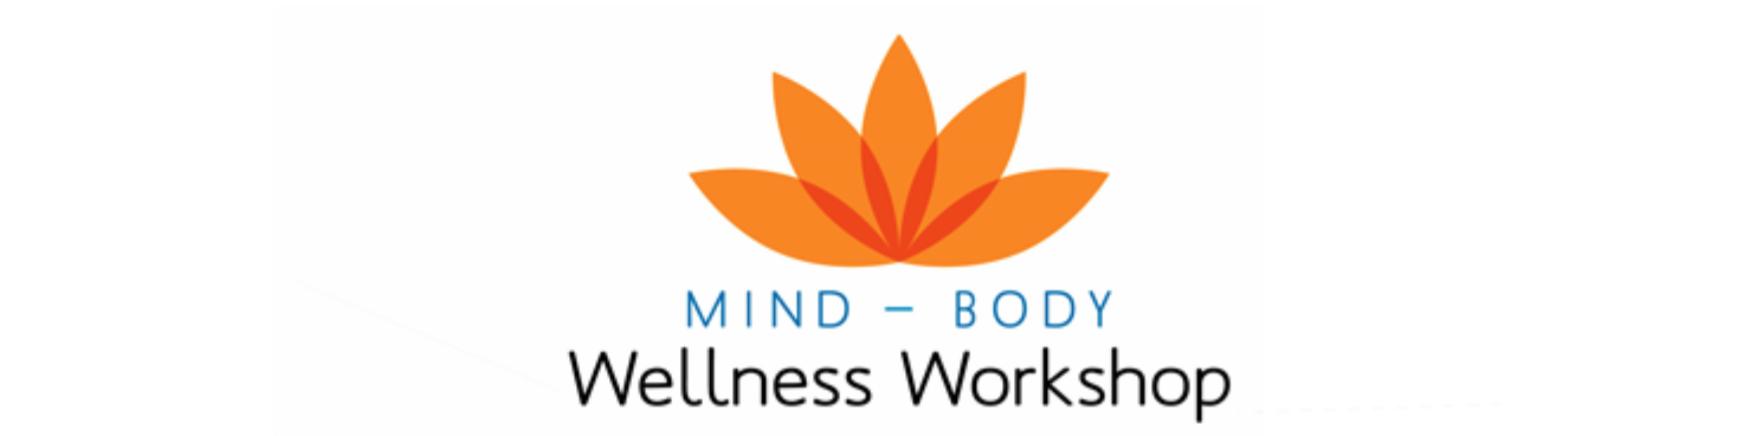 Mind-Body Wellness Workshop